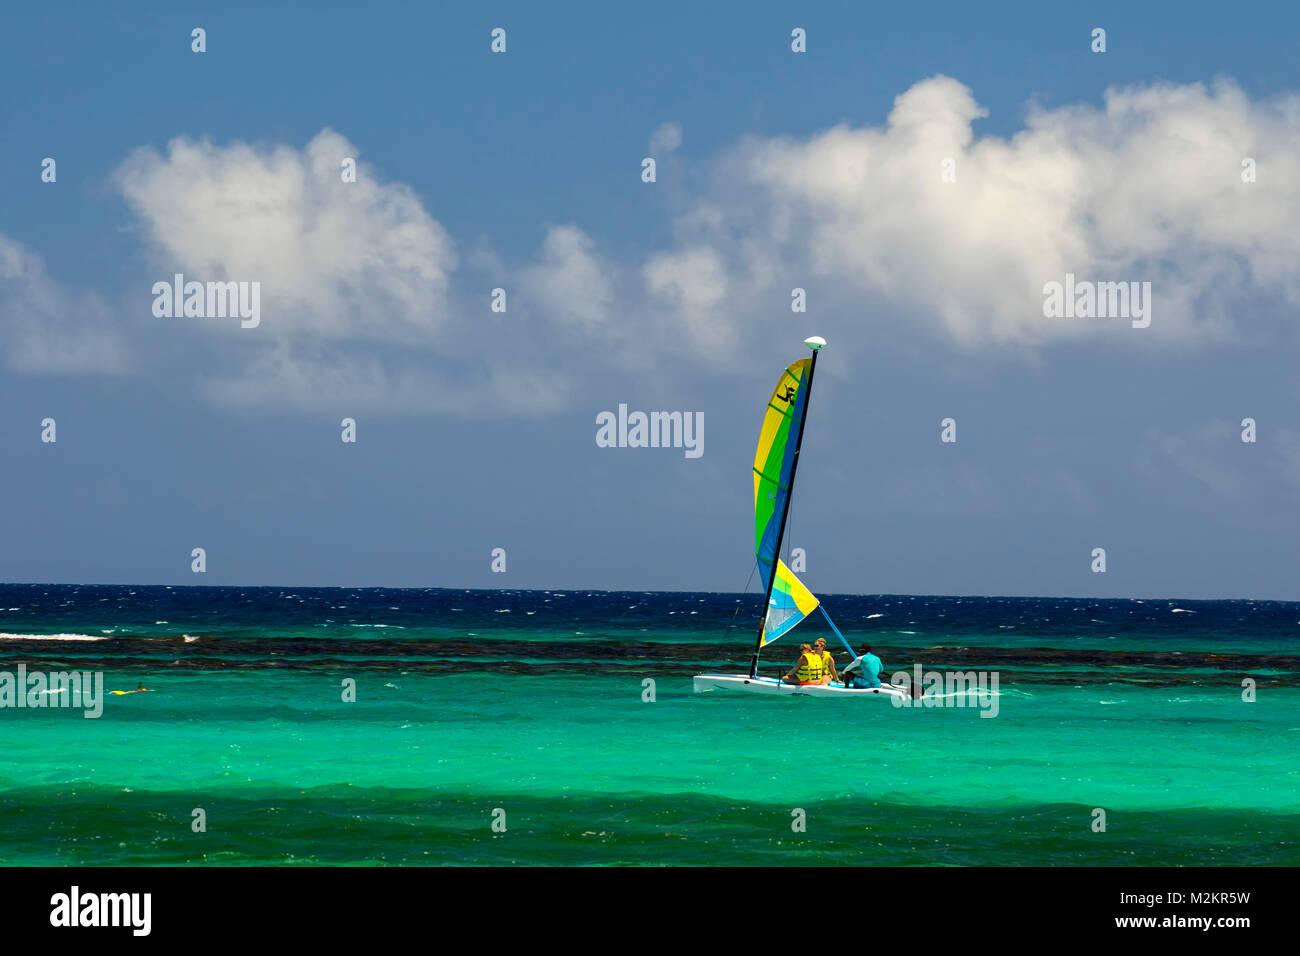 Lone seagoing craft on the Caribbean sea at Mahogany Beach, Ocho Rios, jamaica, West Indies, Caribbean - Stock Image